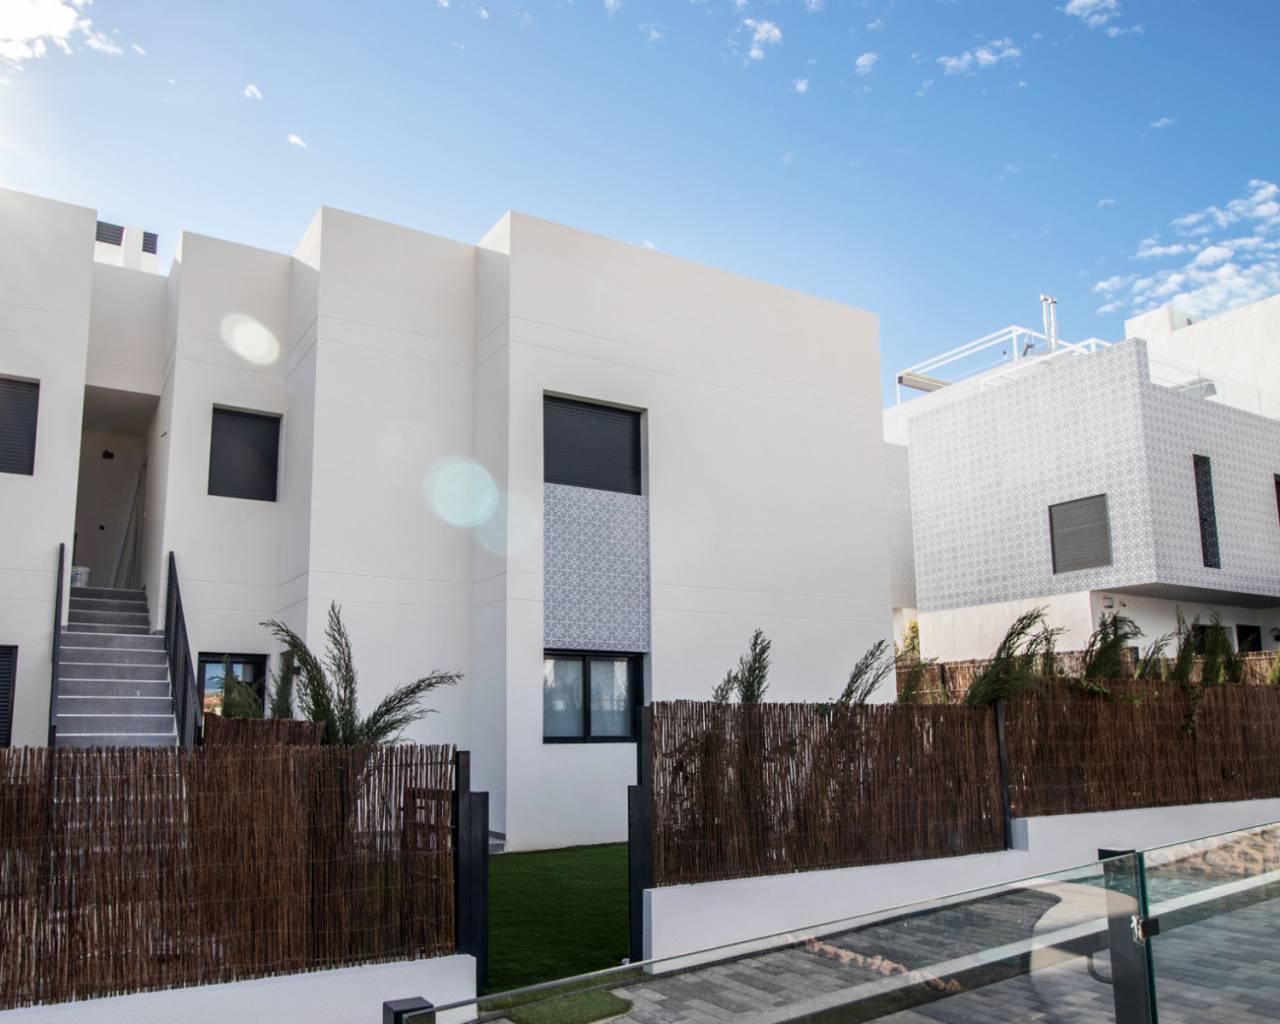 nieuwbouw-appartement-san-miguel-de-salinas_1796_xl